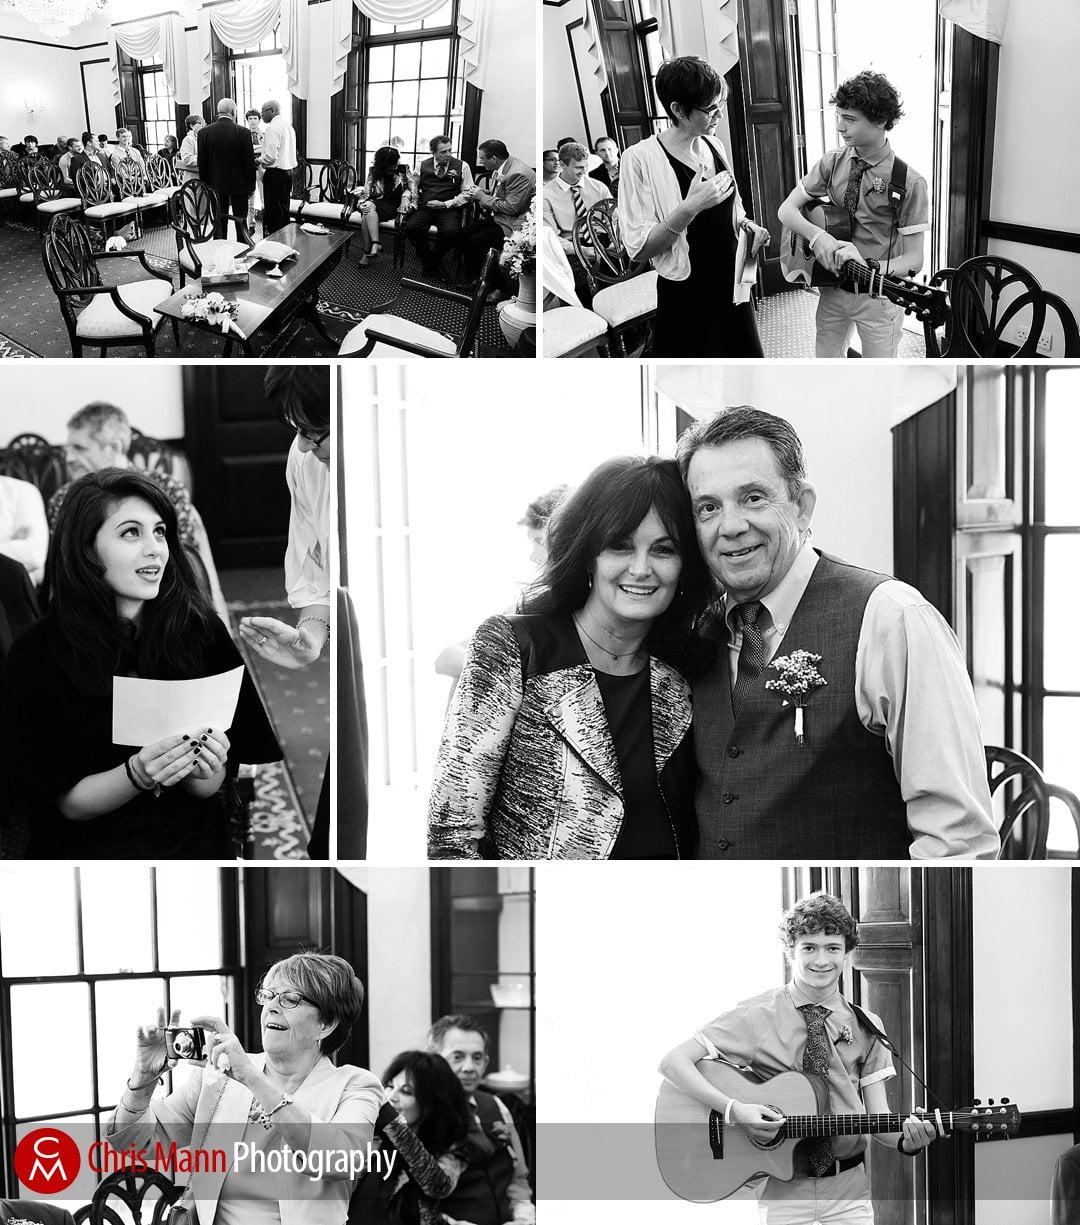 black and white wedding ceremony photos leatherhead registry office